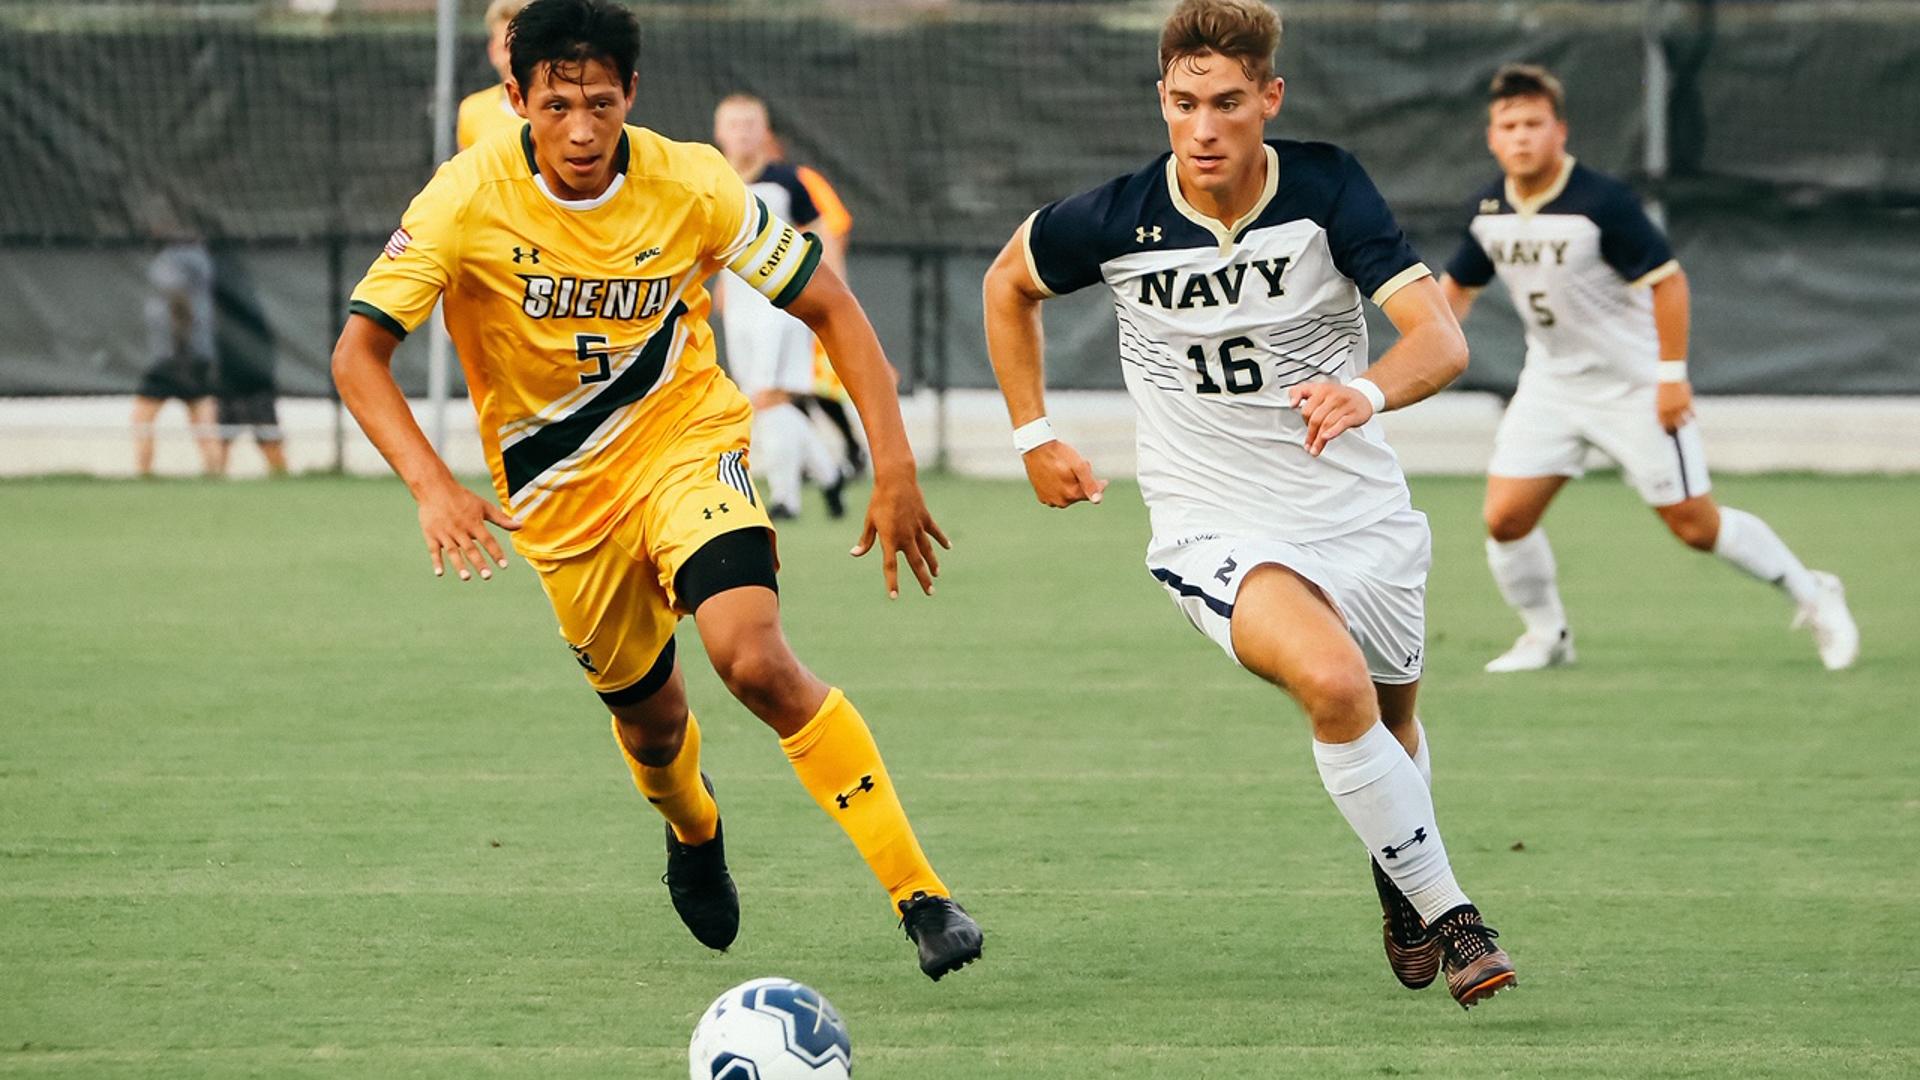 Navy Soccer